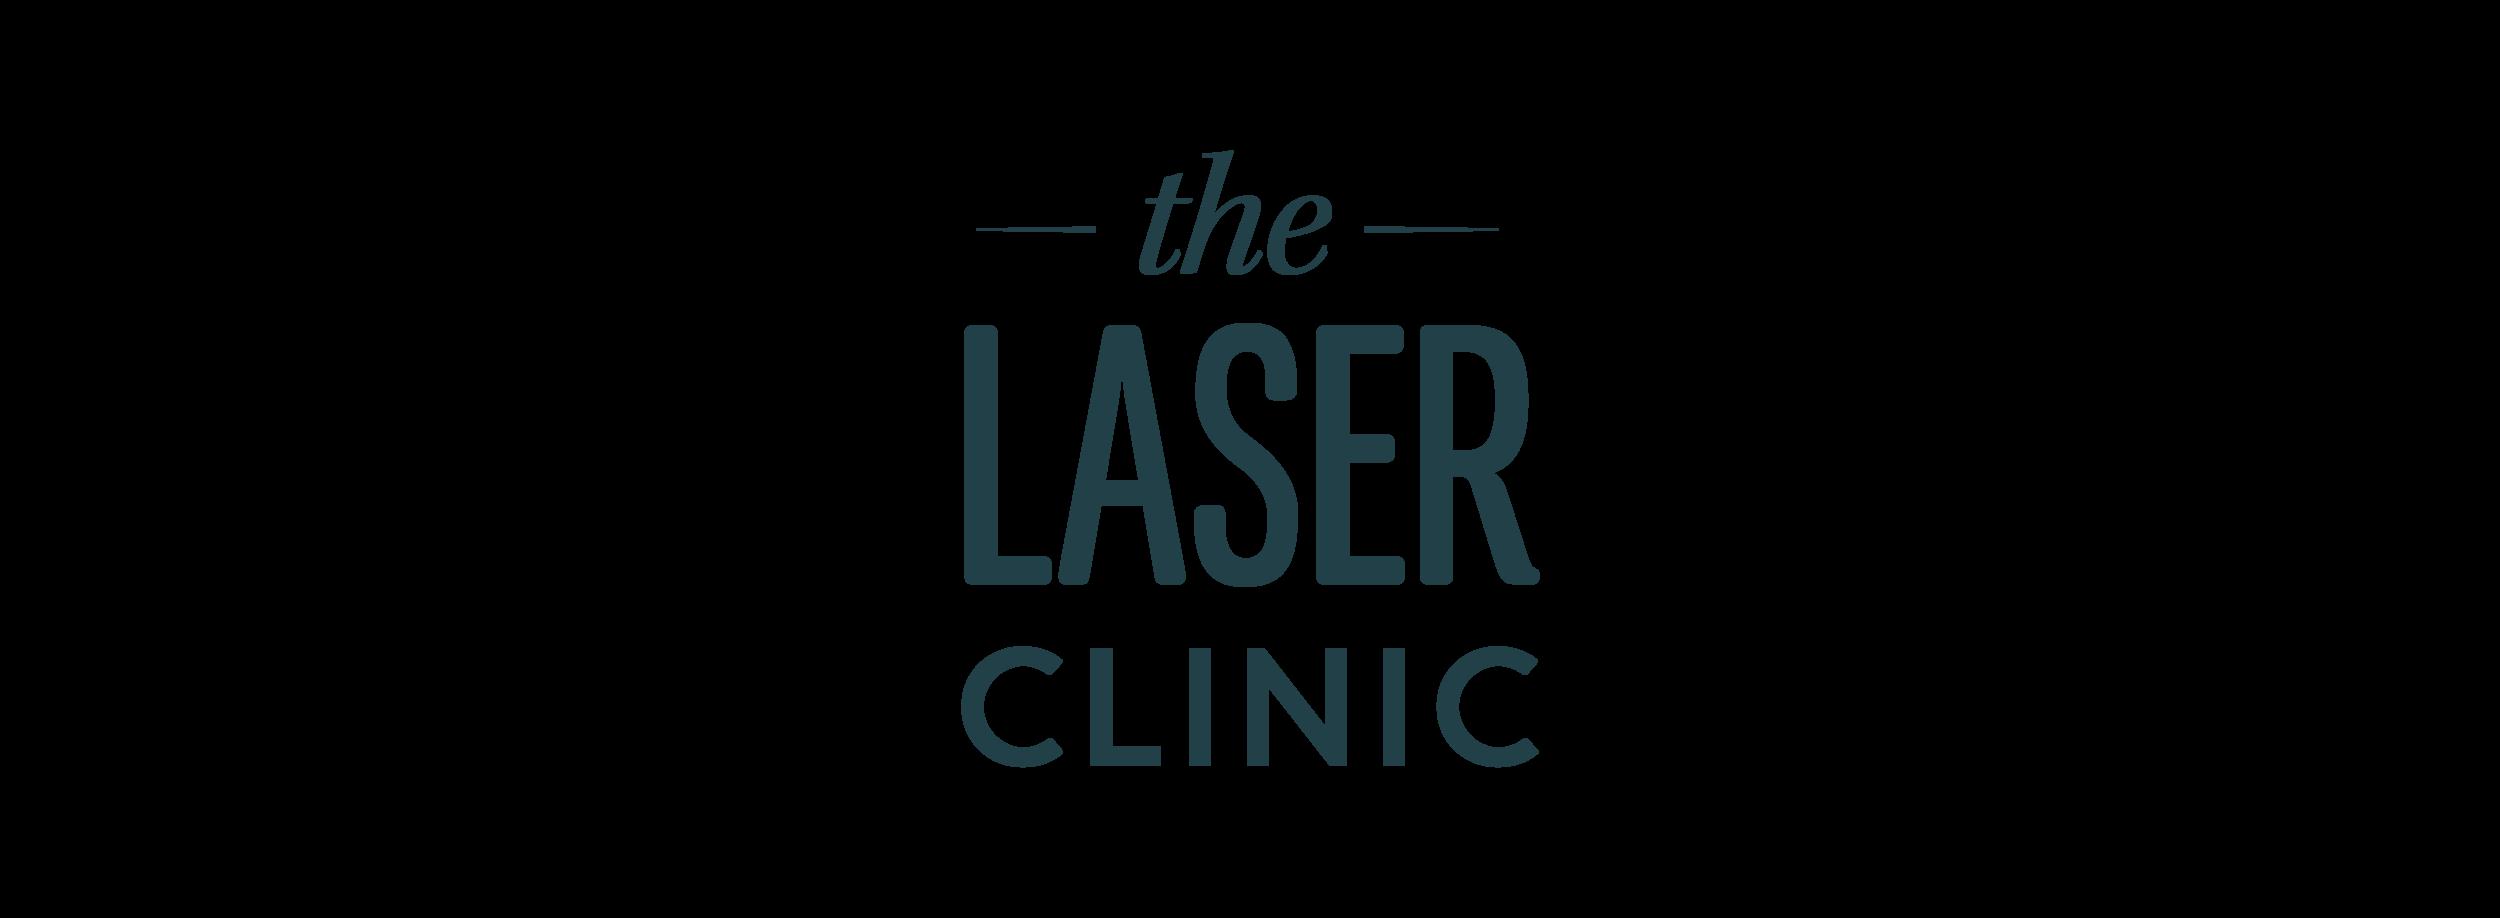 CaseStudyBrandBoard_TheLaserClinic_Template_Main Logo.png